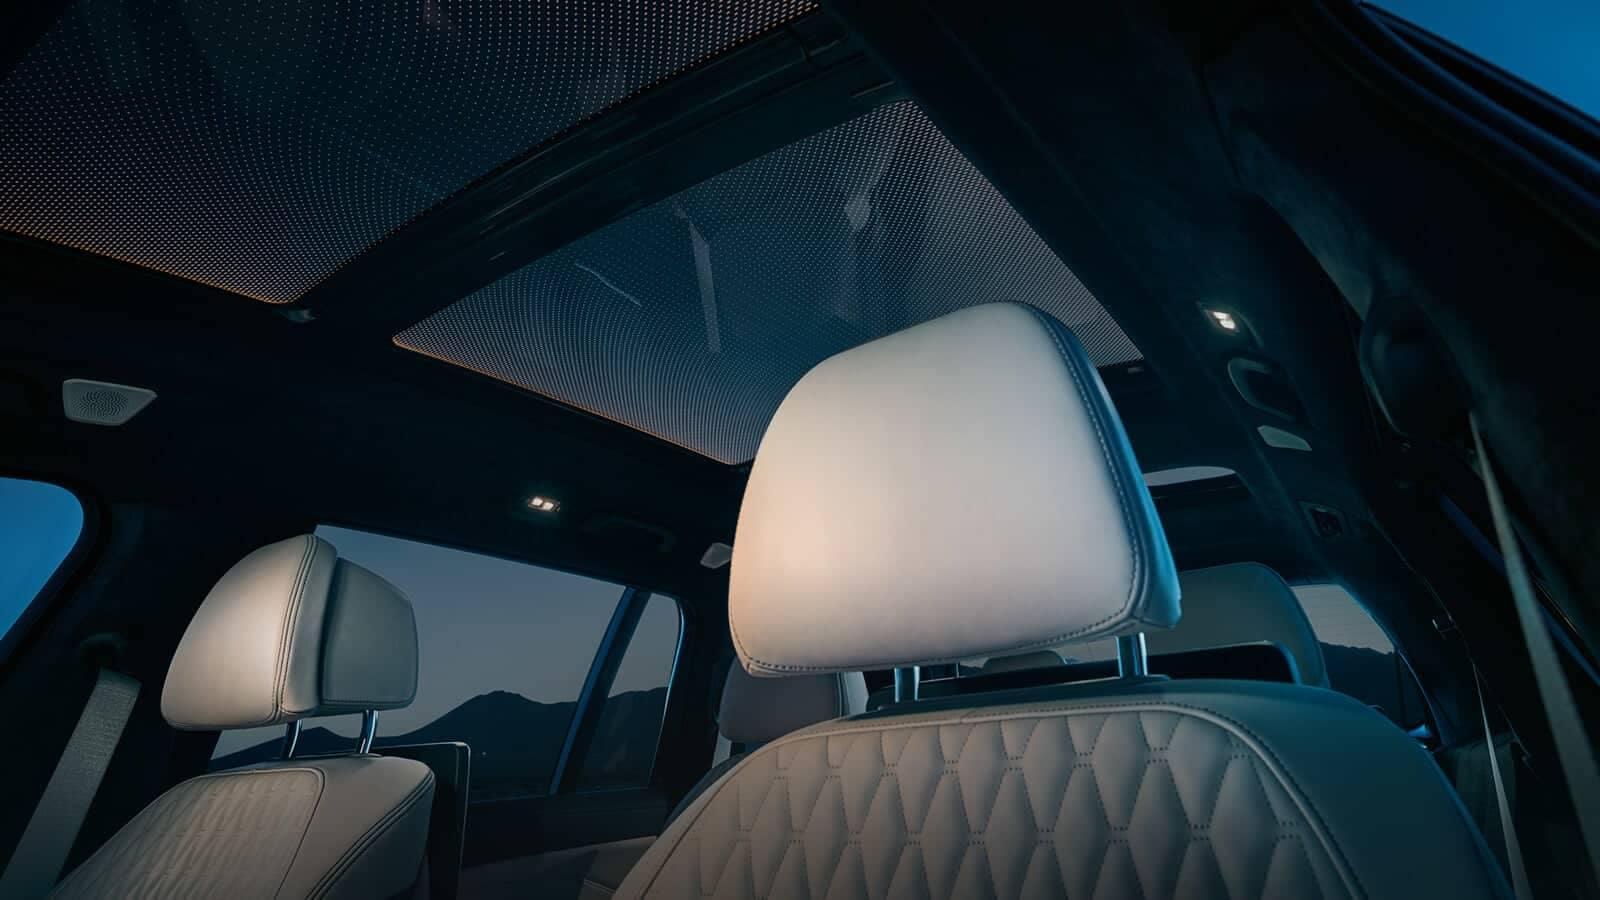 2019 BMW X7 panoramic sky lounge